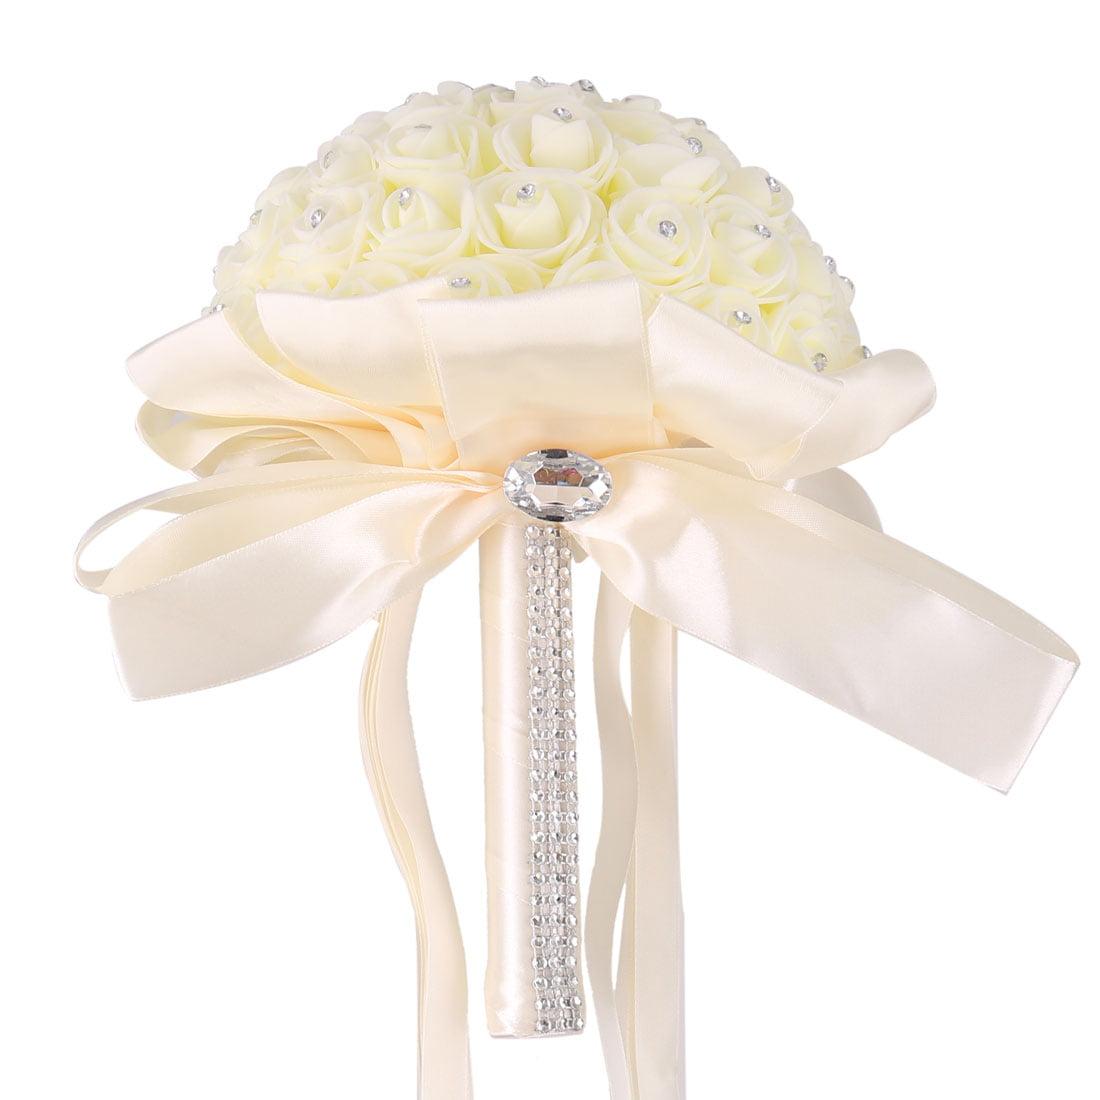 Bridesmaid Wedding Foam Buds Globular Handmade Artificial Flower Bouquet Beige